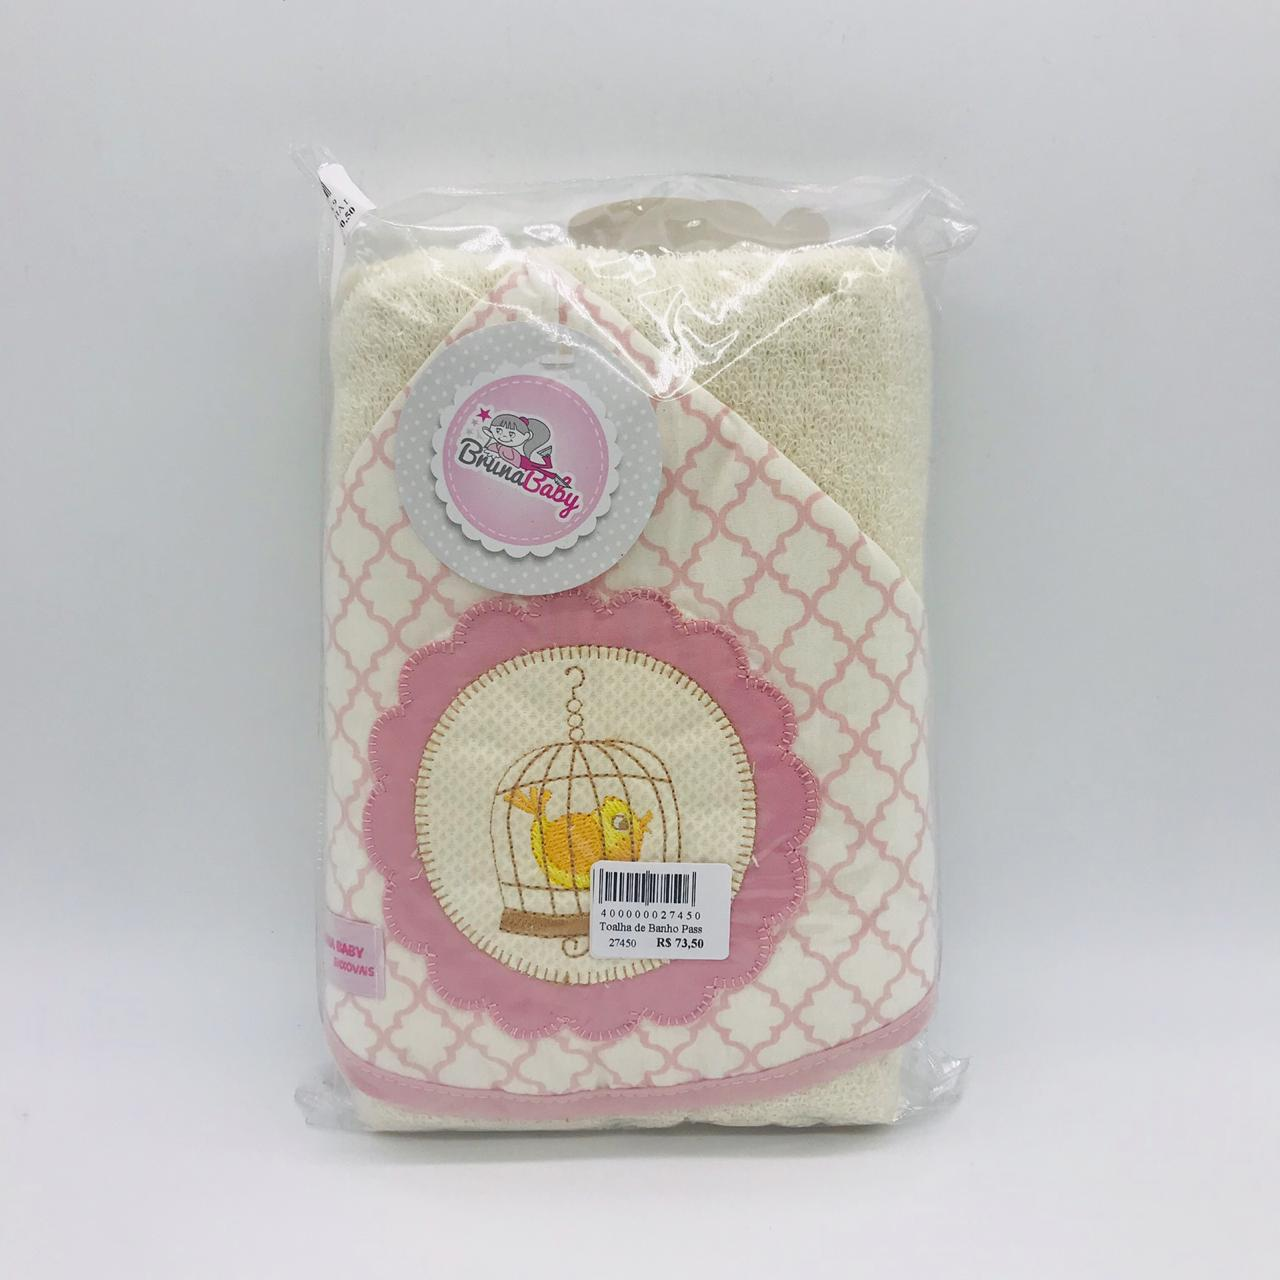 Toalha de Banho Passarinho Rosa - Bruna Baby Ref 30665